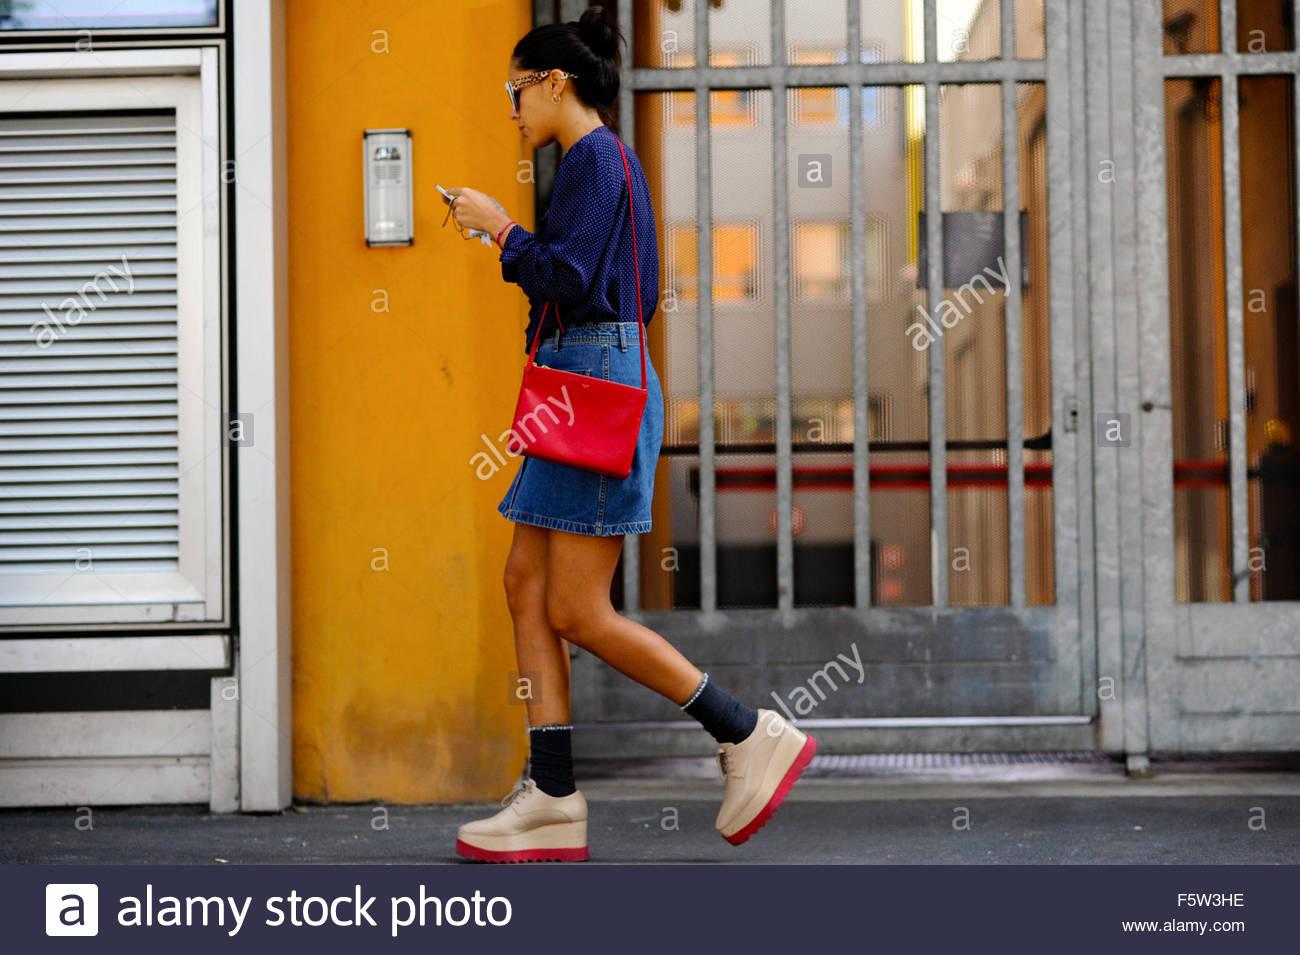 After Dazy Shely, SS16 Via Bergognone, Milan Fashion Week Italy 2015. - Stock Image